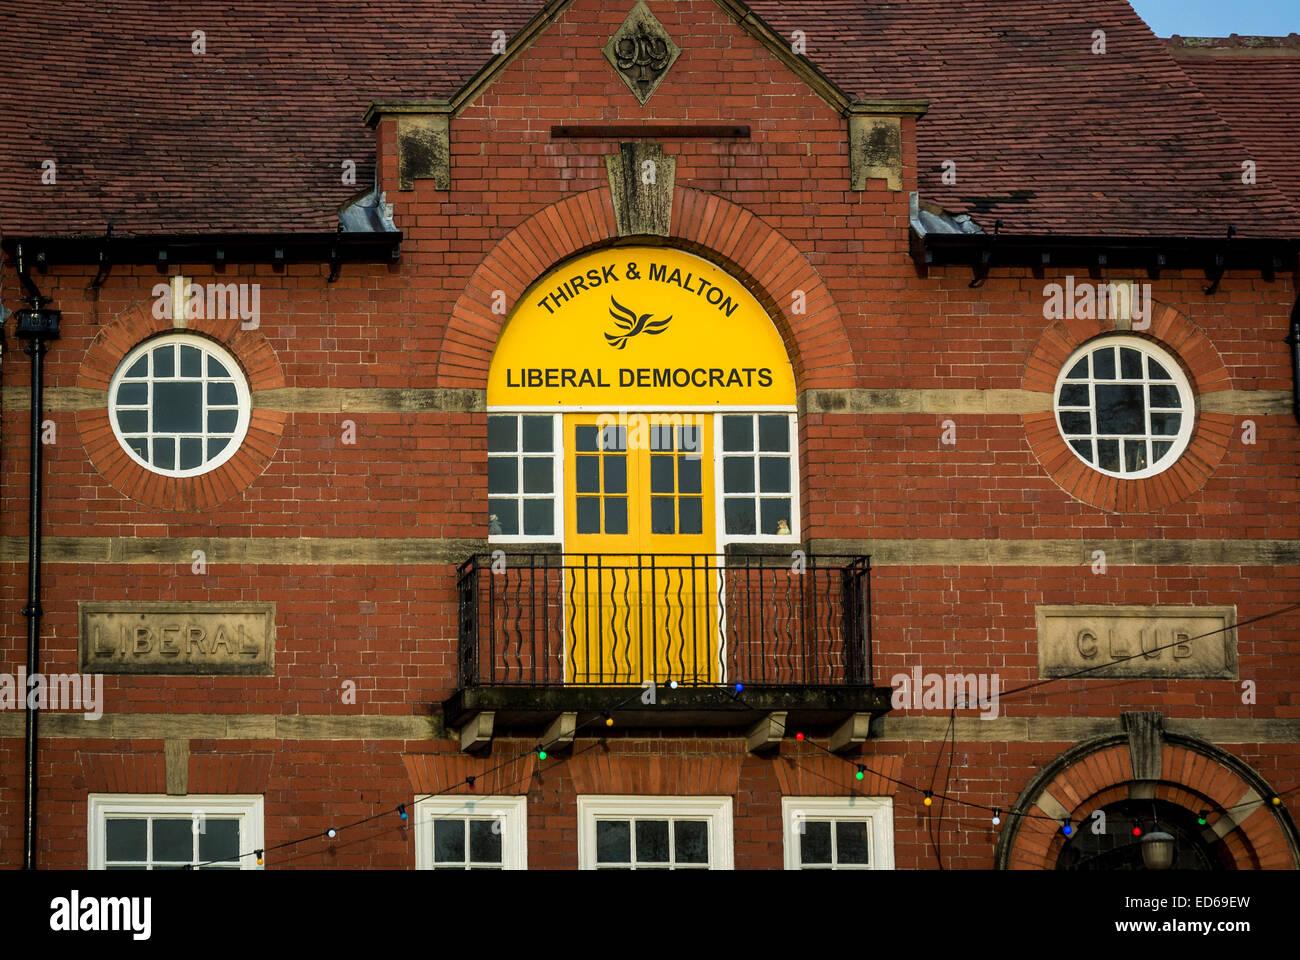 Liberal Democrats Club building, Pickering, North Yorkshire. - Stock Image